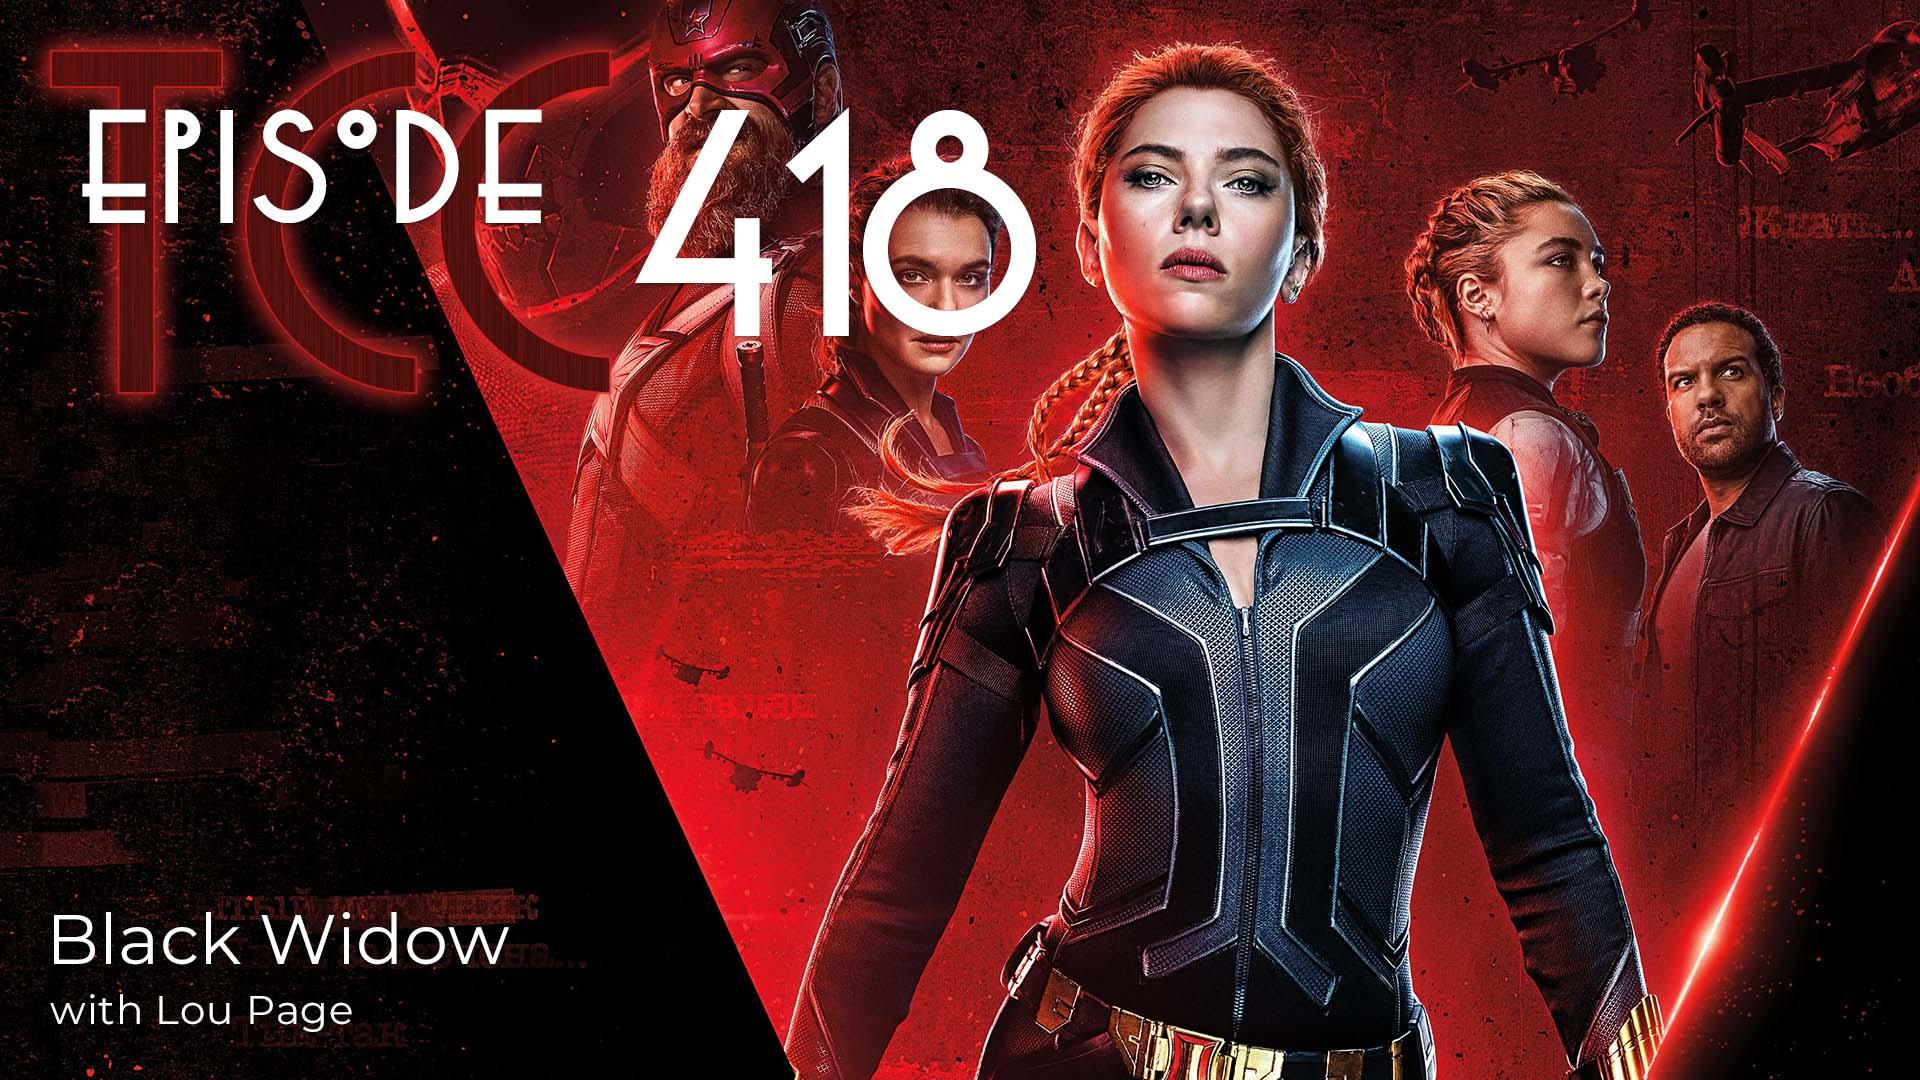 The Citadel Cafe 418: Black Widow